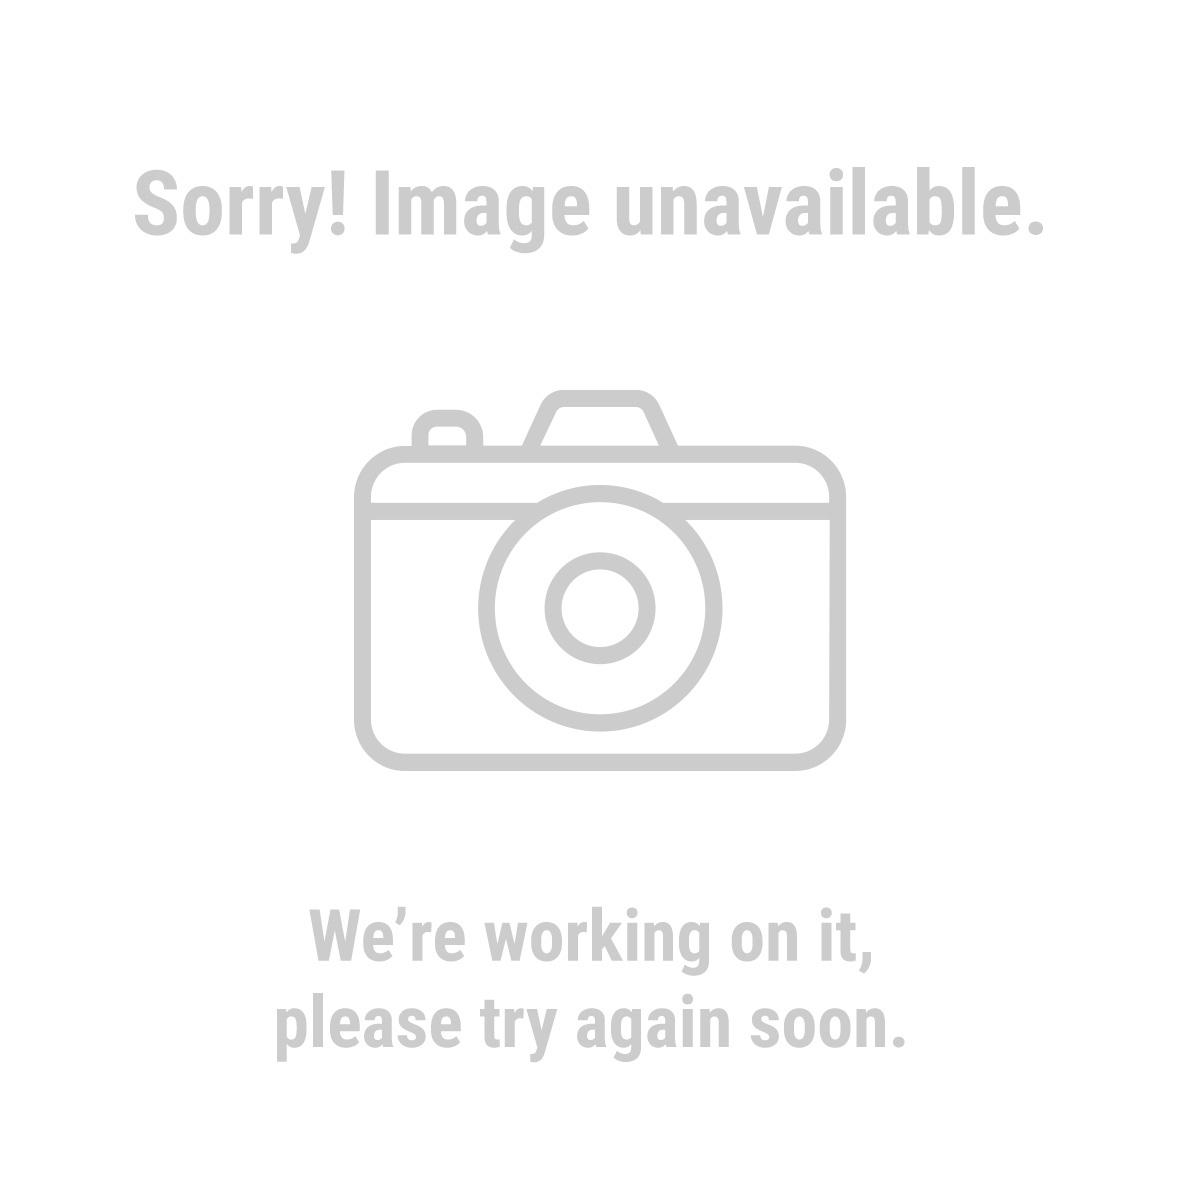 U.S. General® 98103 Black Onyx Roller Cabinet Top Chest